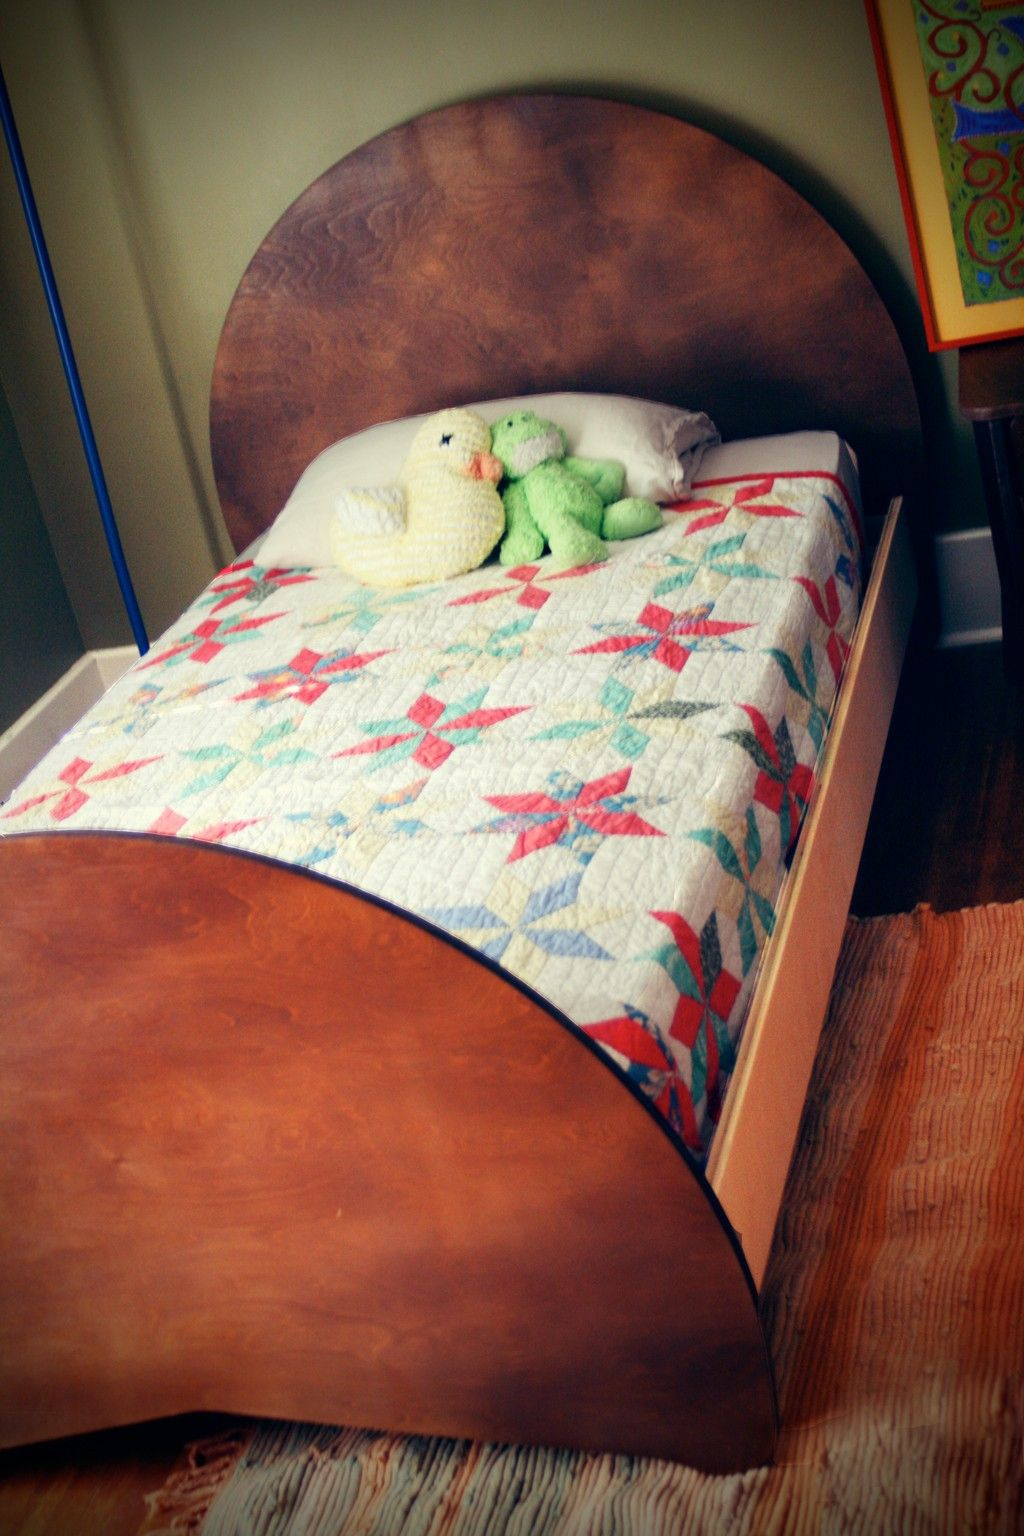 Sodura Aero Kids Twin Bed Kids Room Modern Kids Beds Kid Beds